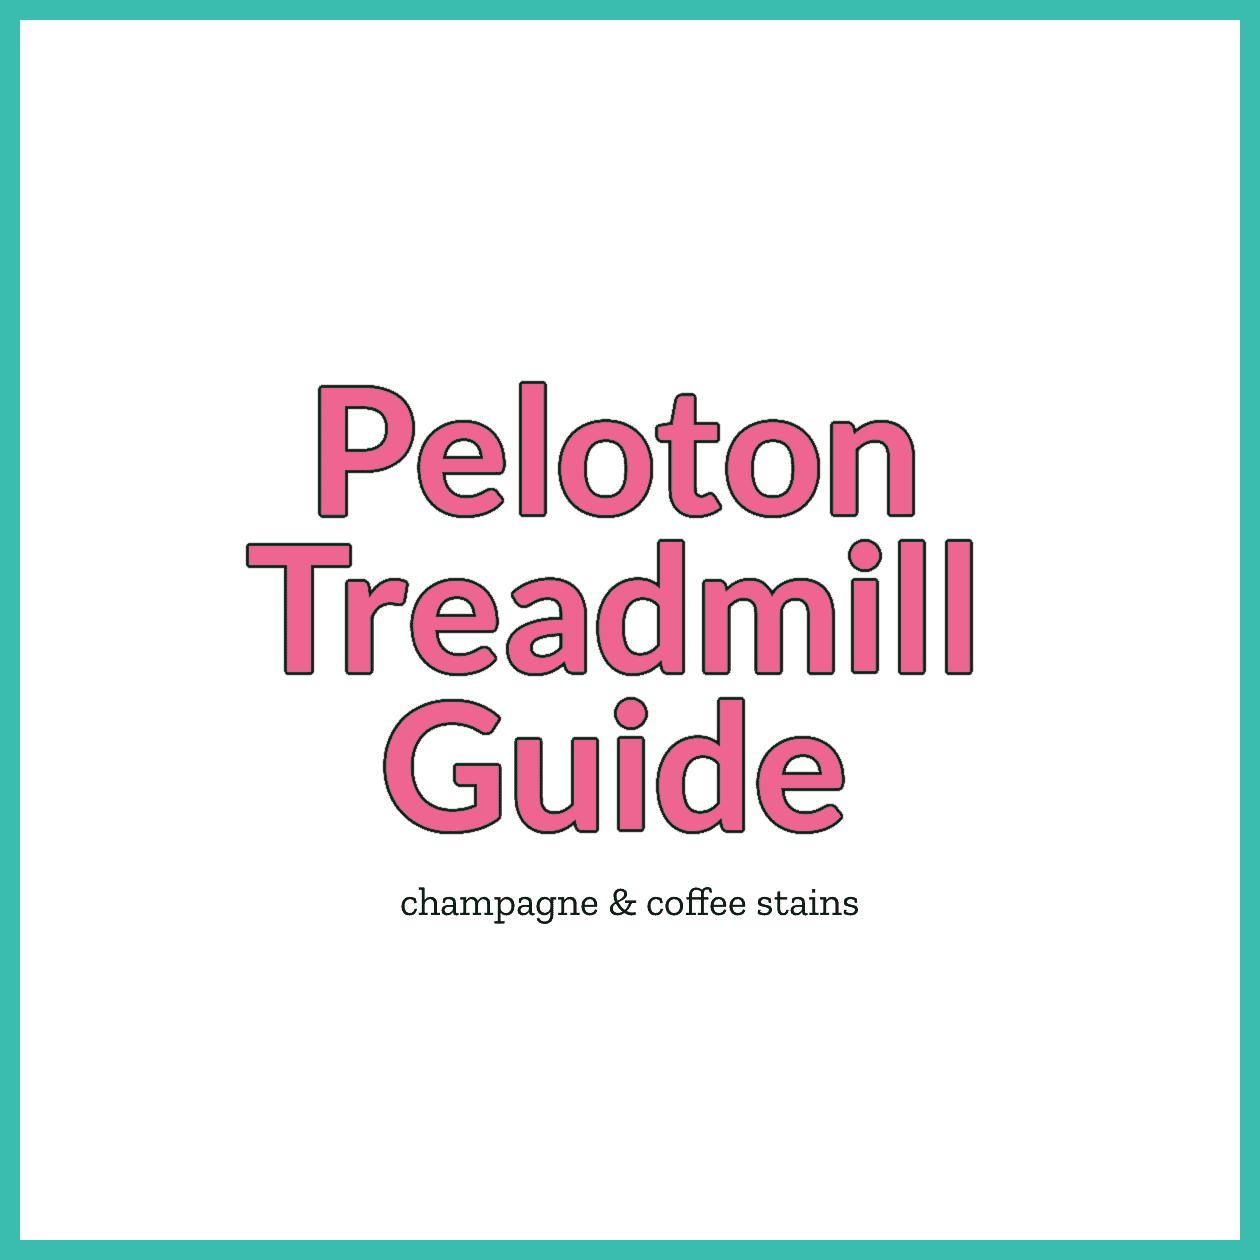 peloton treadmill guide blog image